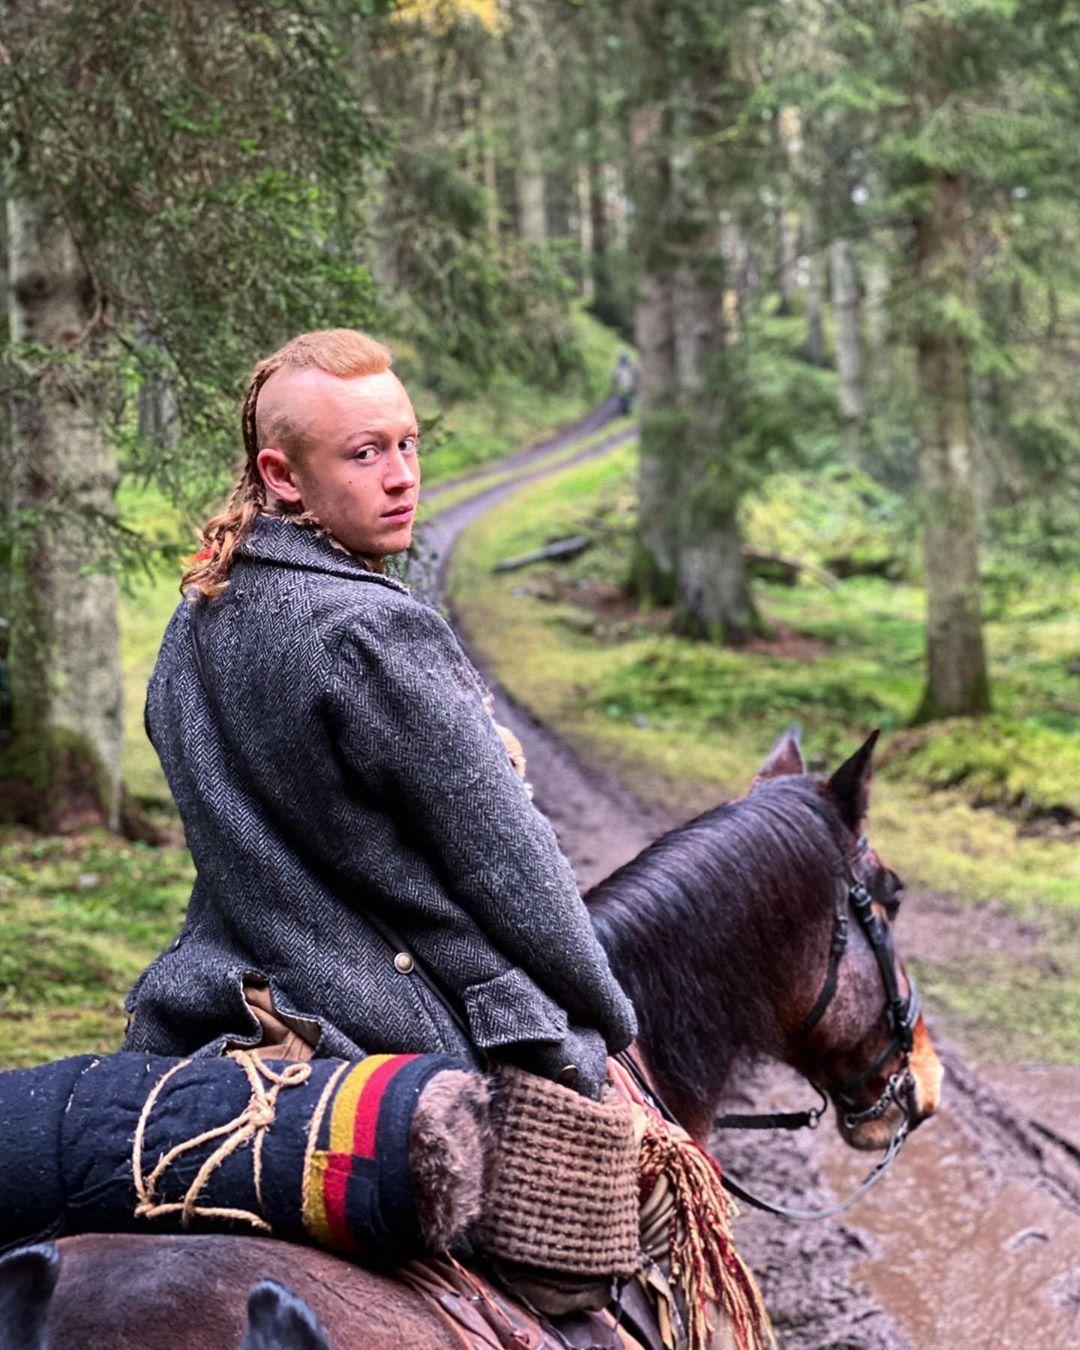 Pin on Outlander BOOK5 The FIERY CROSS